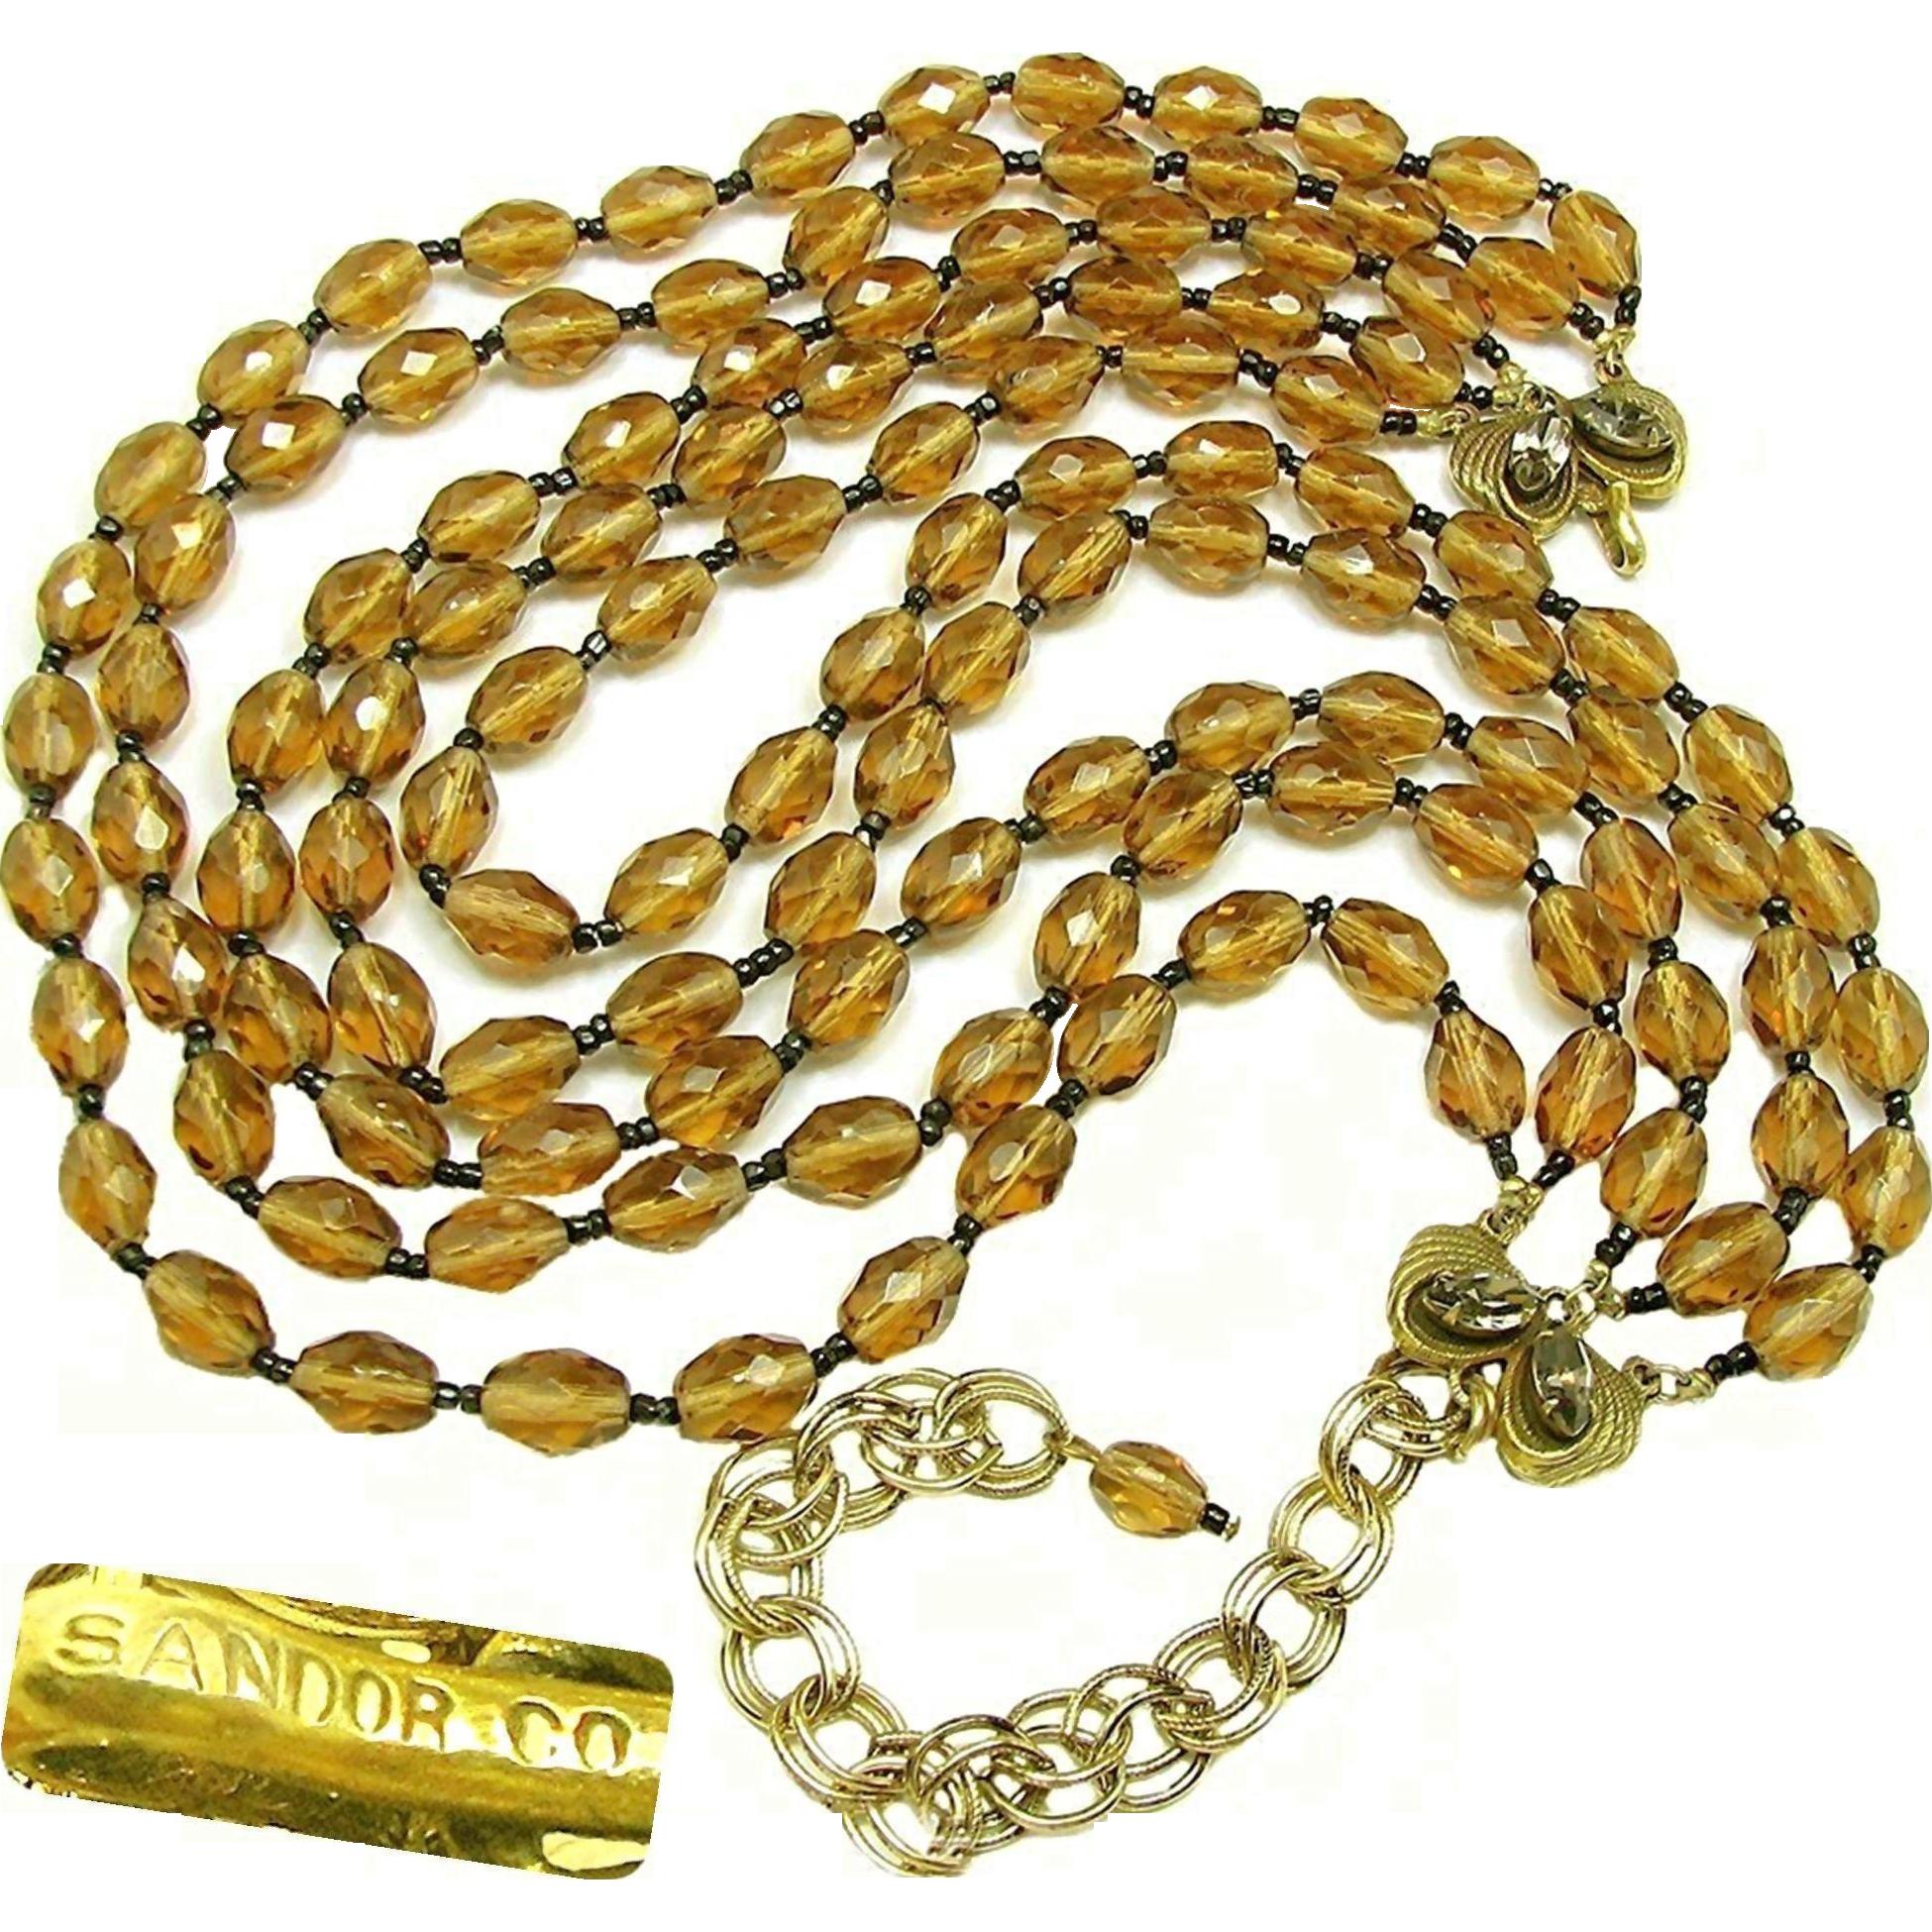 Vintage SANDOR 5-Strand Mid-Century Necklace of Smokey Topaz Glass